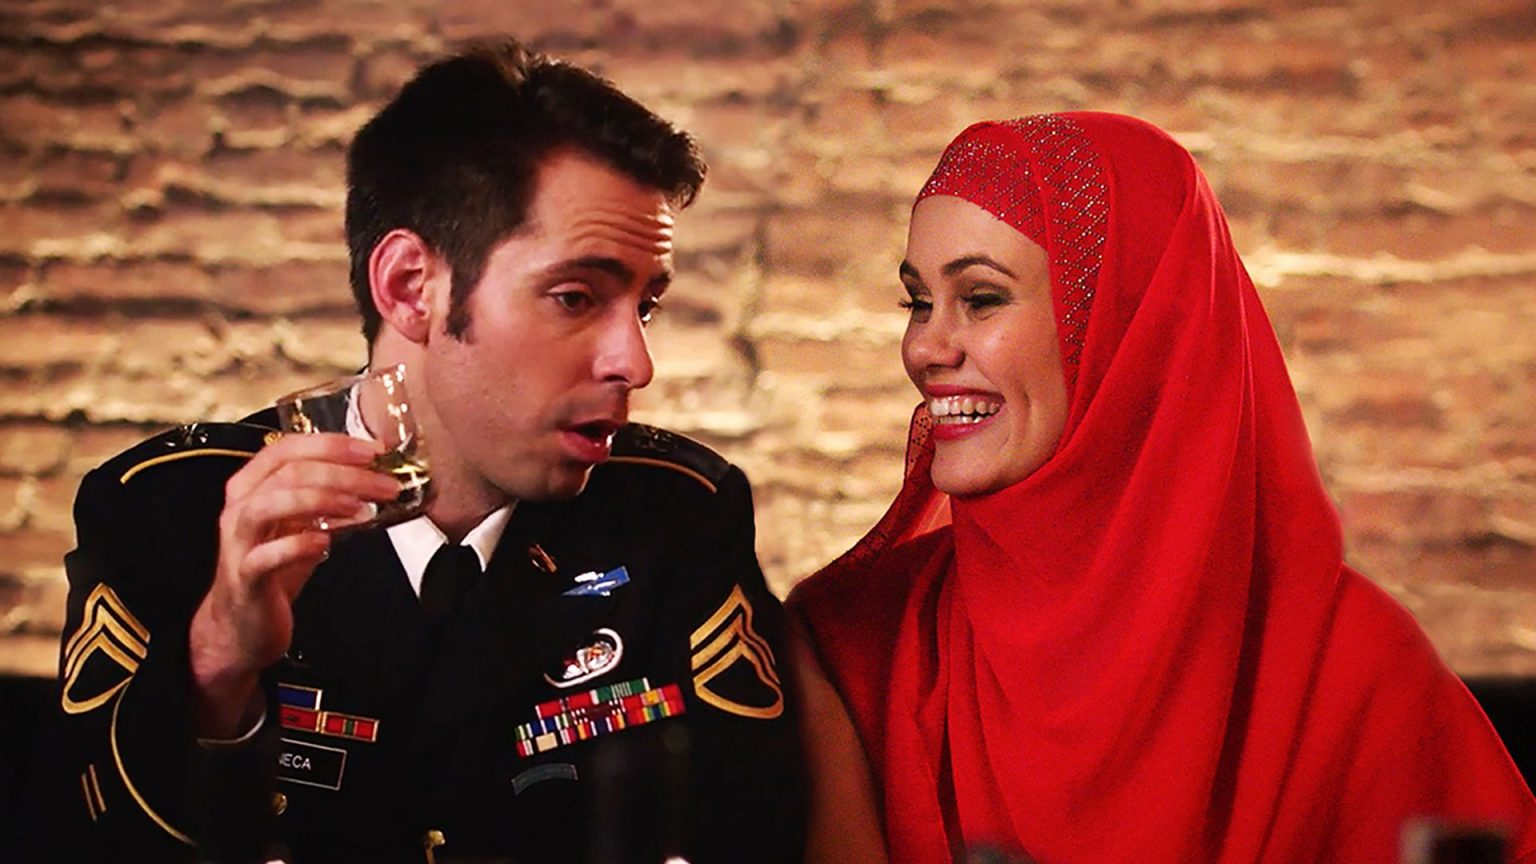 Film poster of Amira & Sam